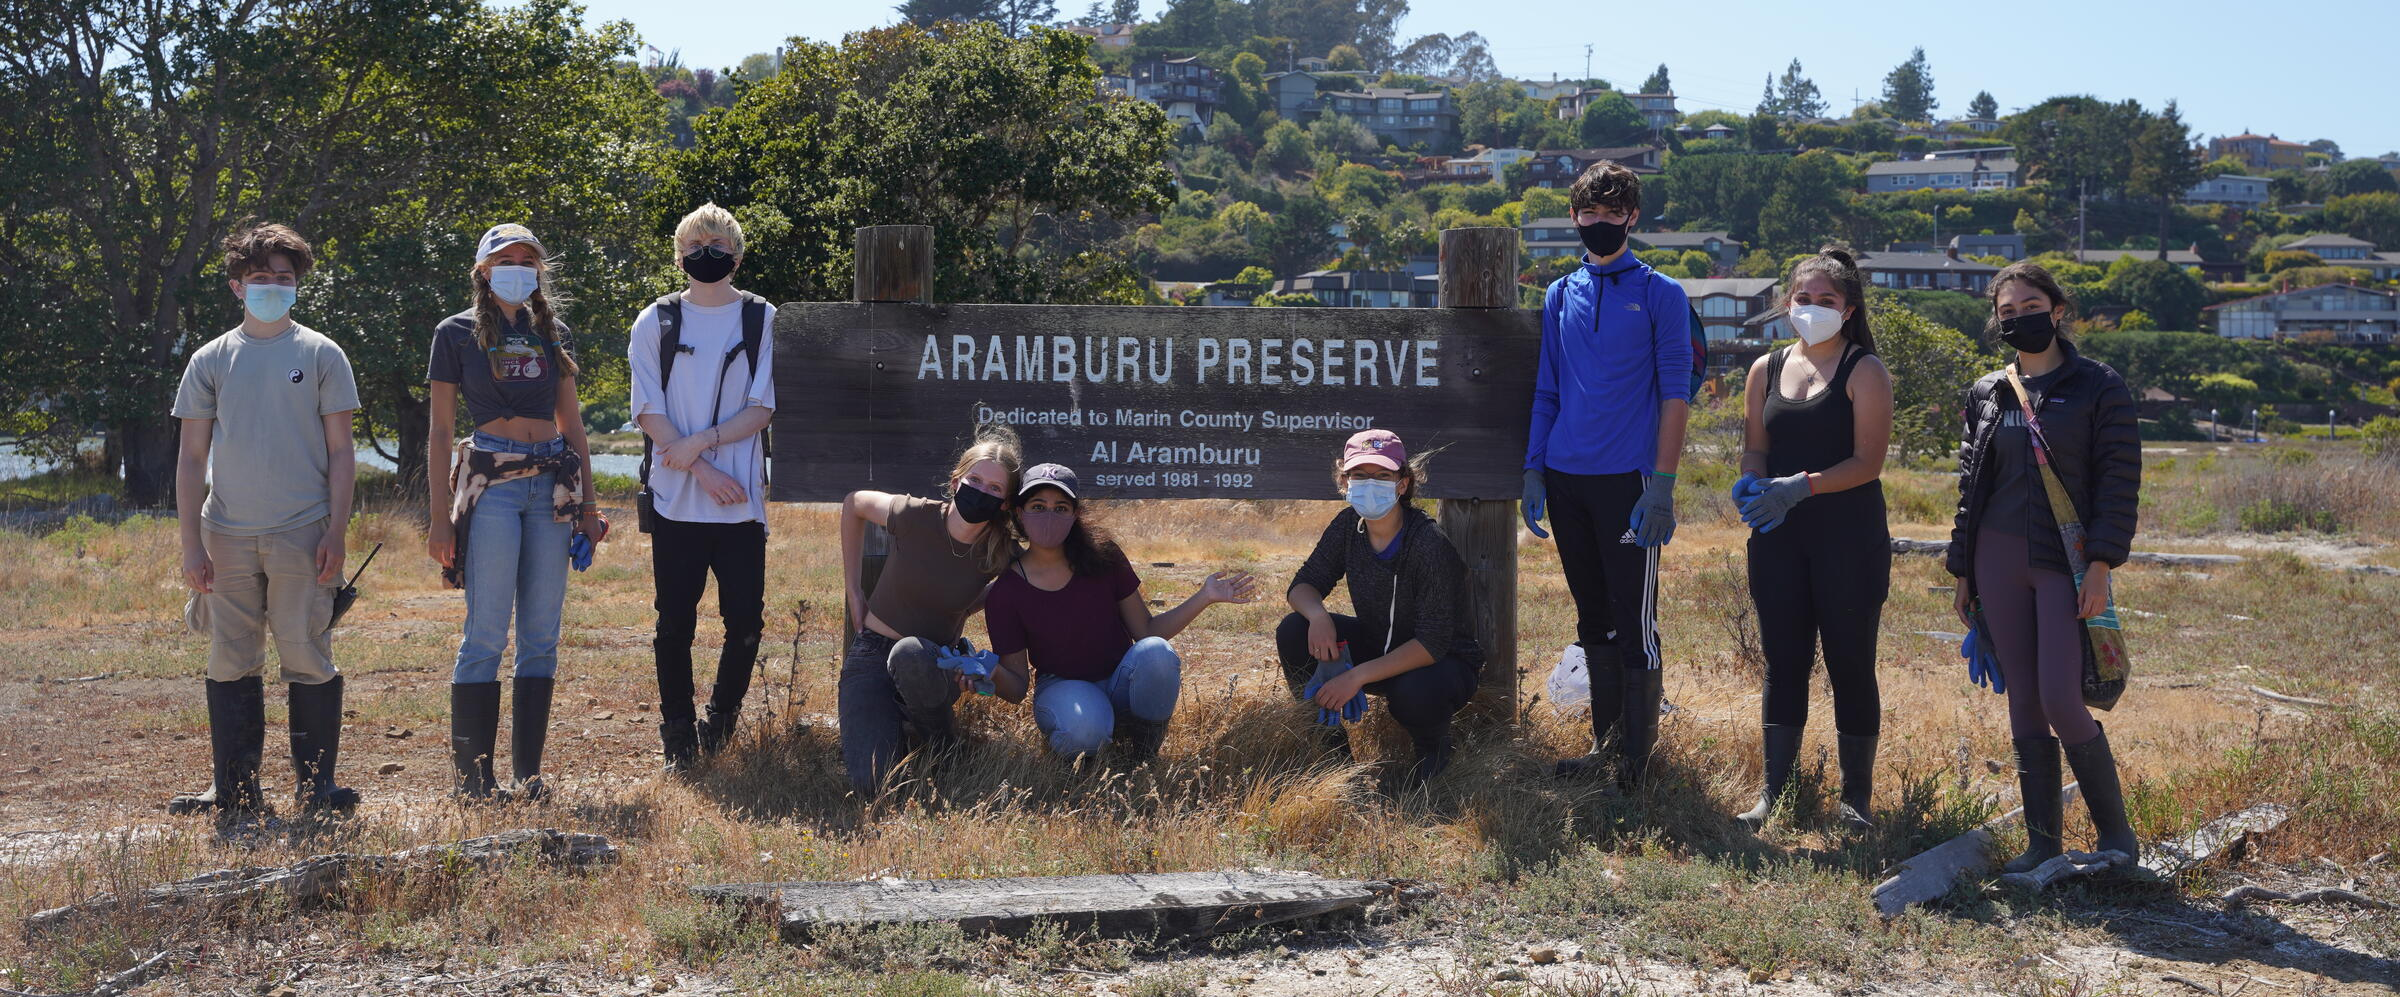 Volunteers Standing at Aramburu Island Sign